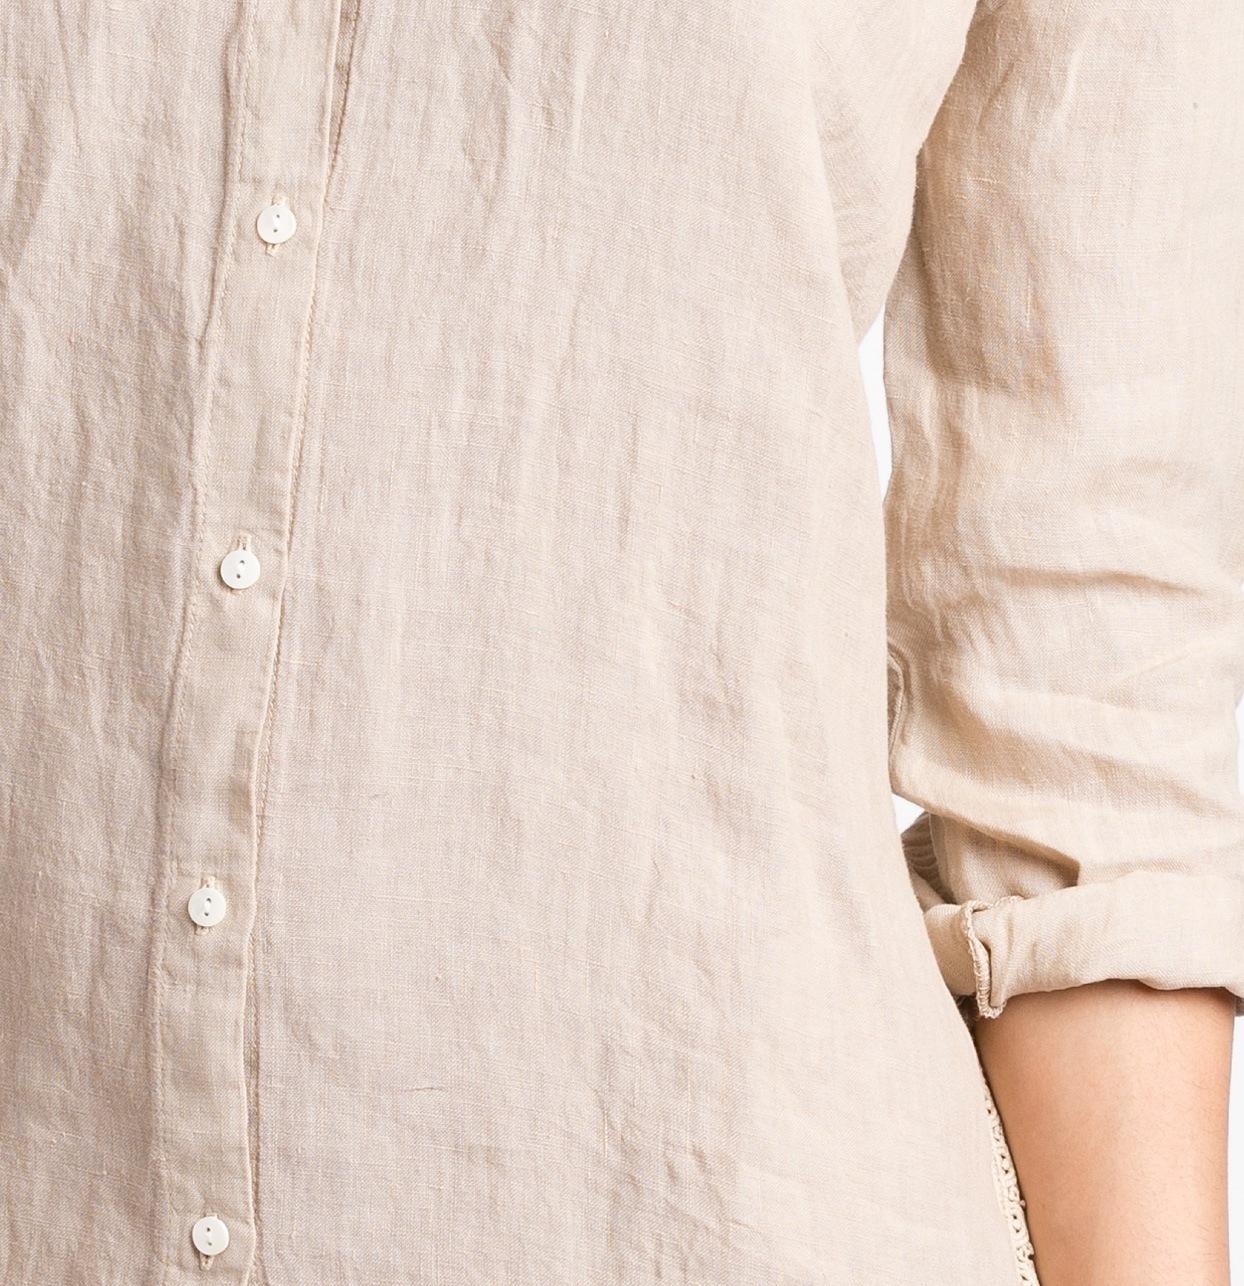 Vestido camisero oversize modelo EPOS color beige, 100% lino. - Ítem2